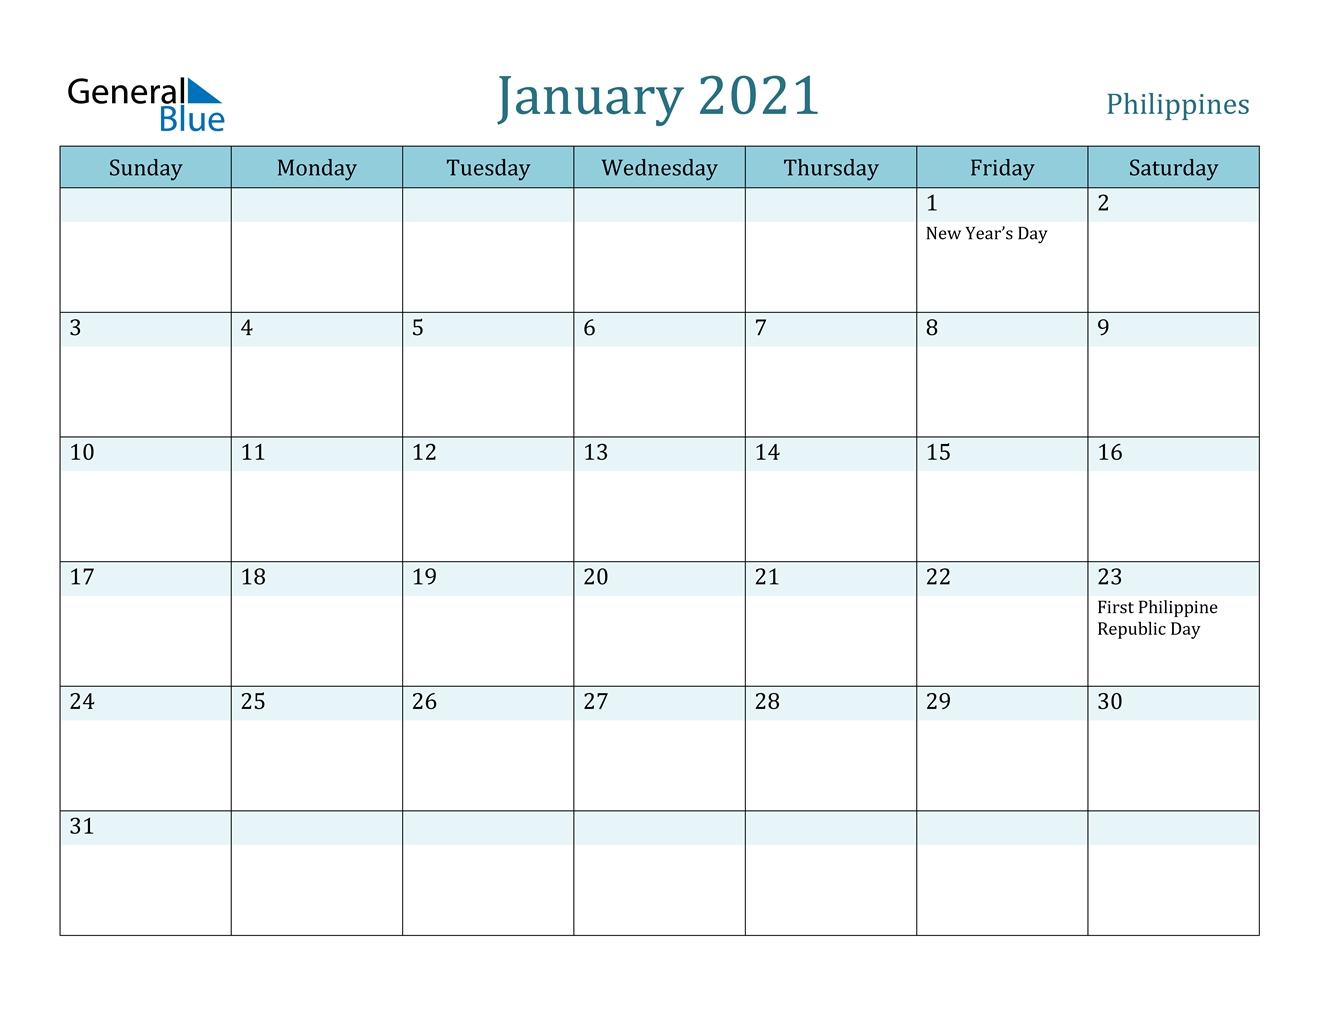 January 2021 Calendar - Philippines inside 2021 Calendar Philippine Holidays Photo